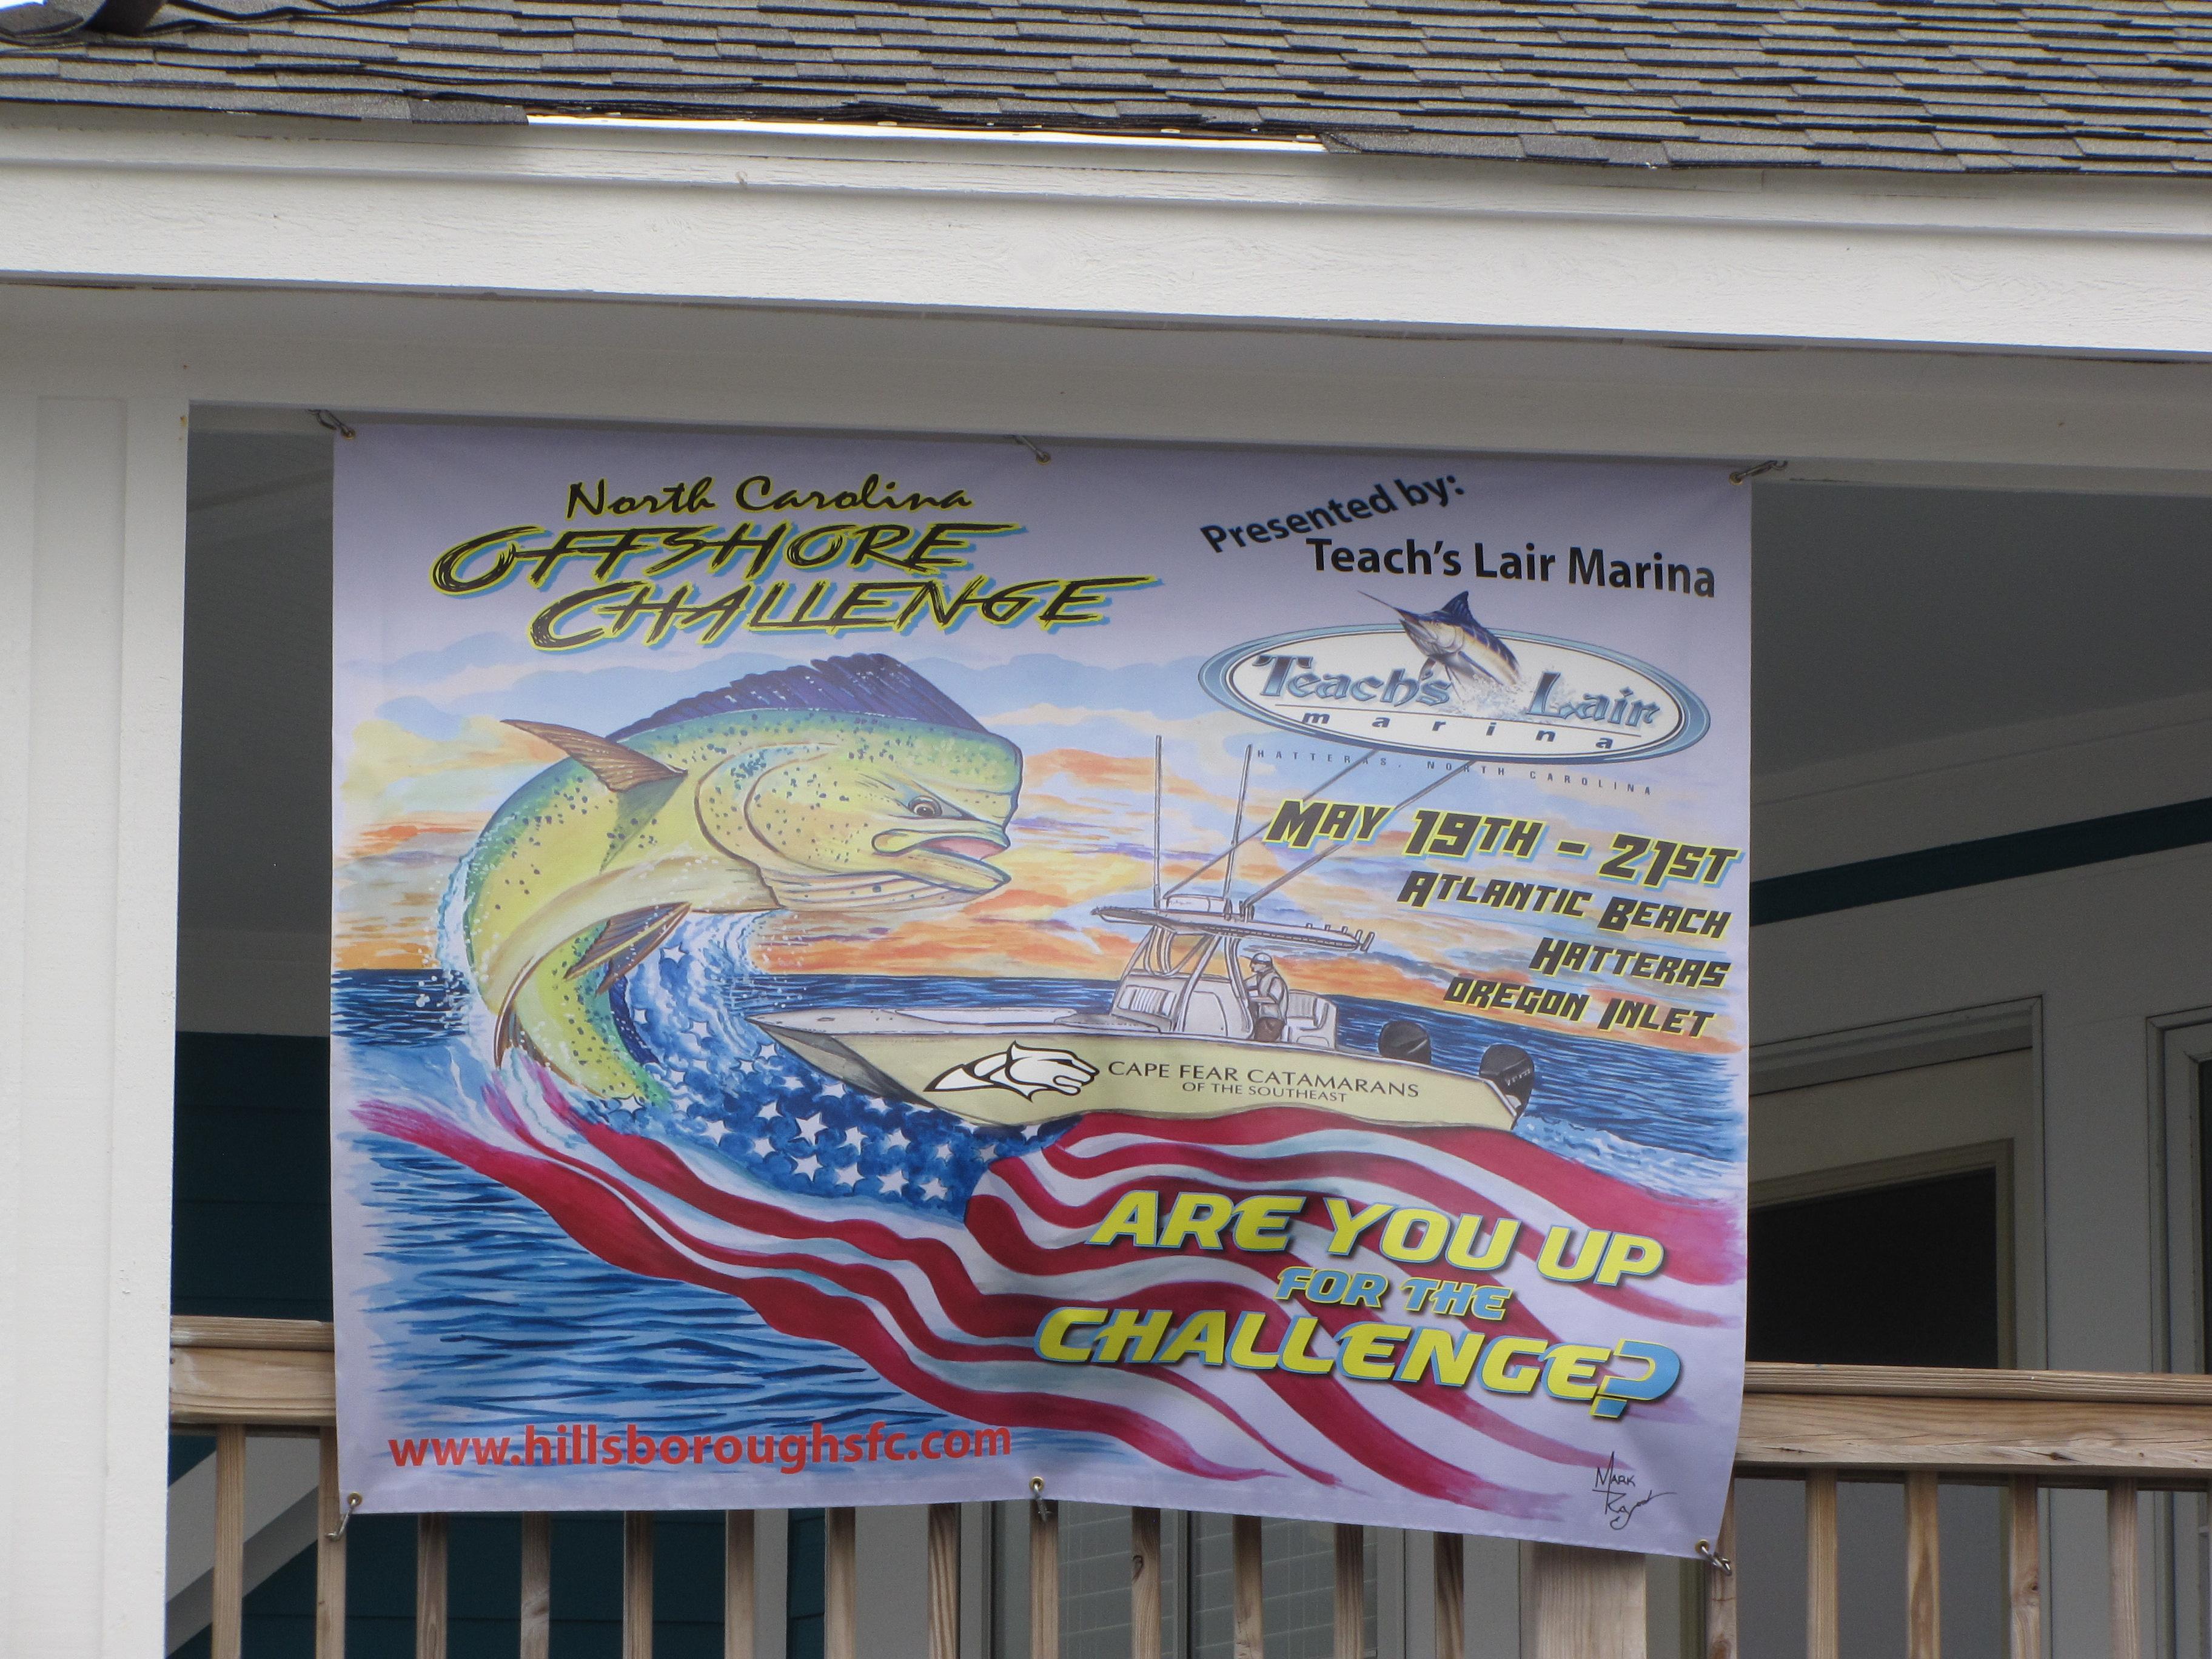 Dolphin Tournament Fun Hatteras Fishing Prizes Teach's Lair Marina